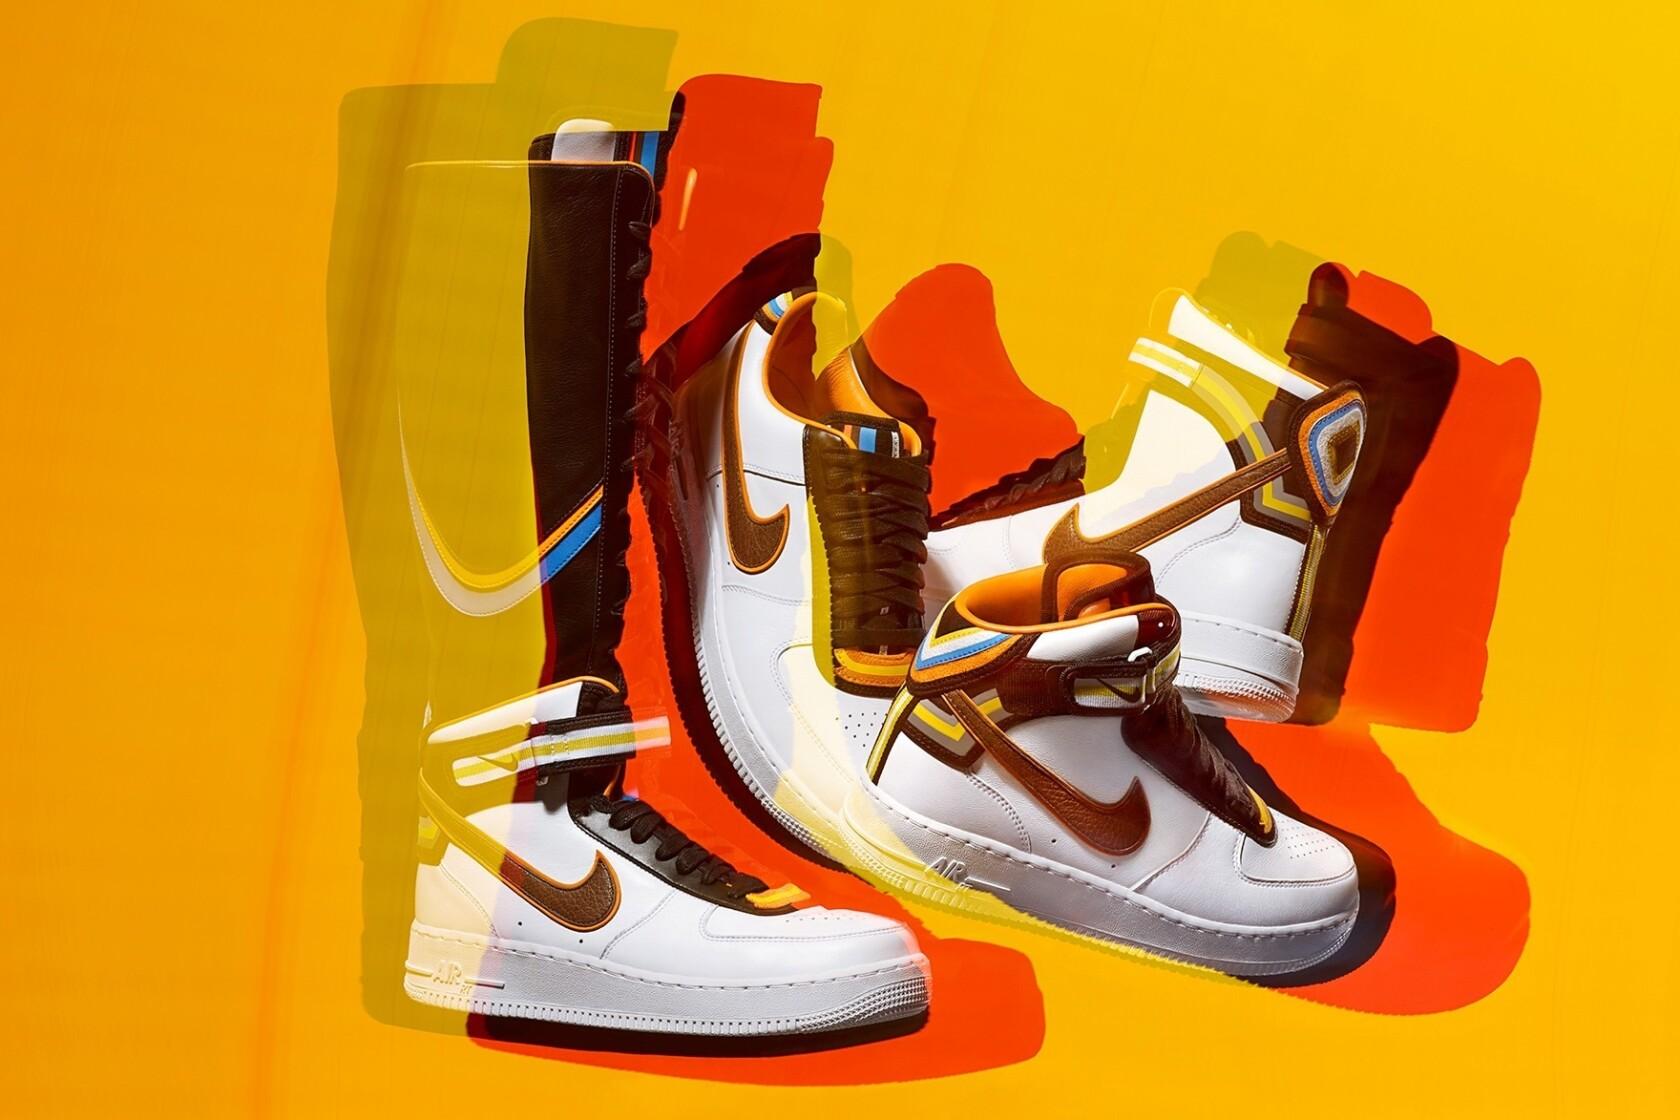 720b9972d20 Nike X Riccardo Tisci sneaker collaboration hits e-tail Friday - Los ...